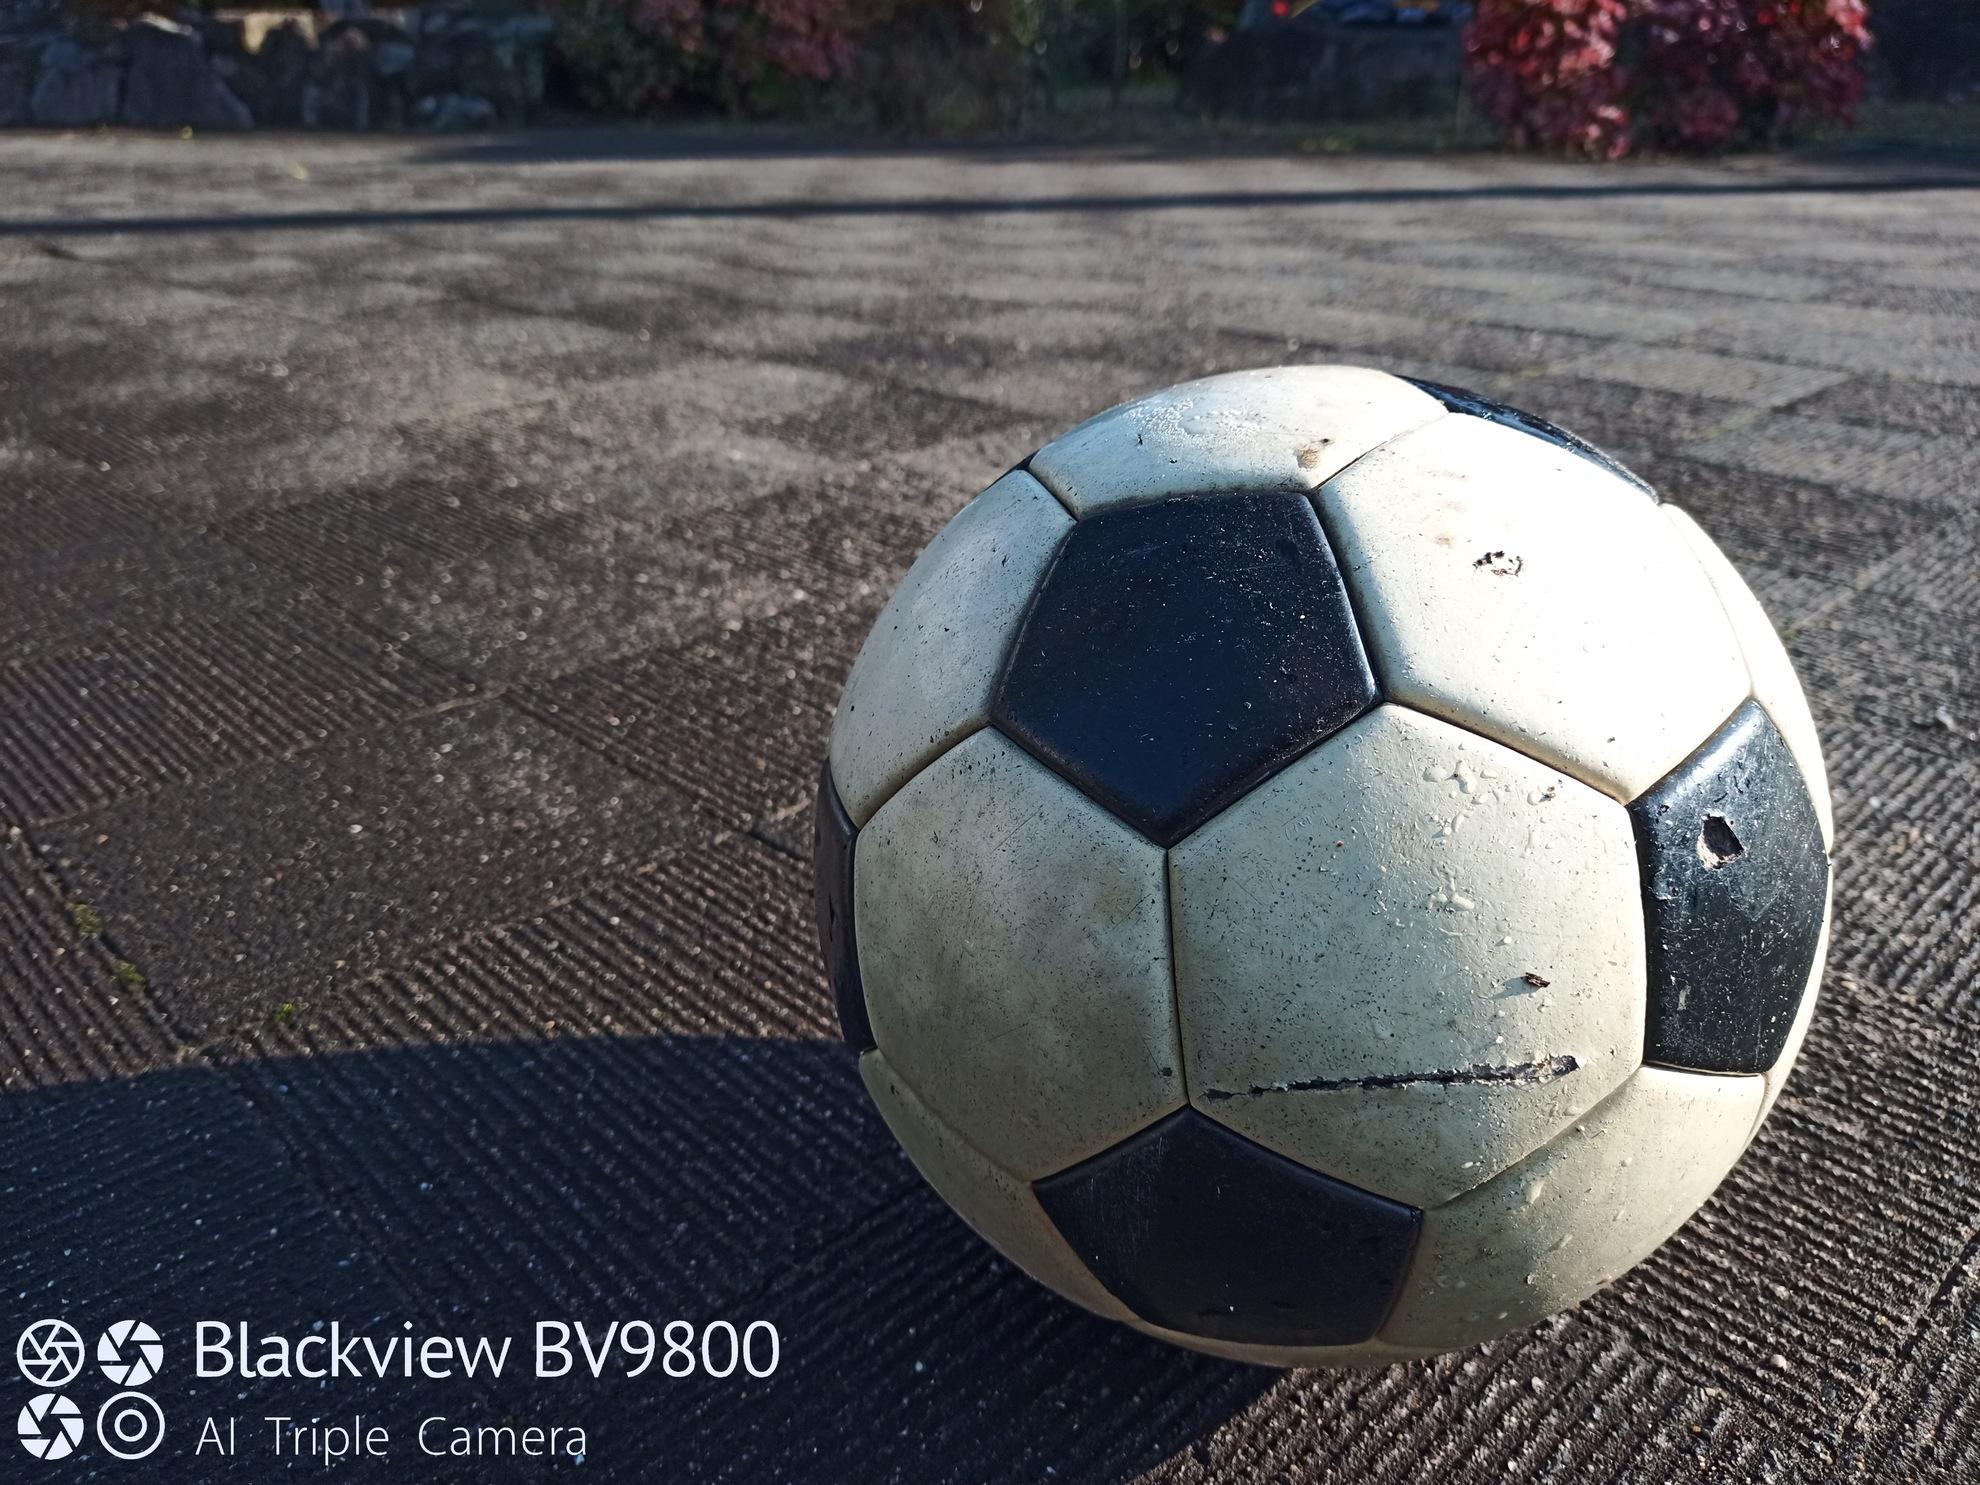 BV9800撮影カメラサンプル ぼかし